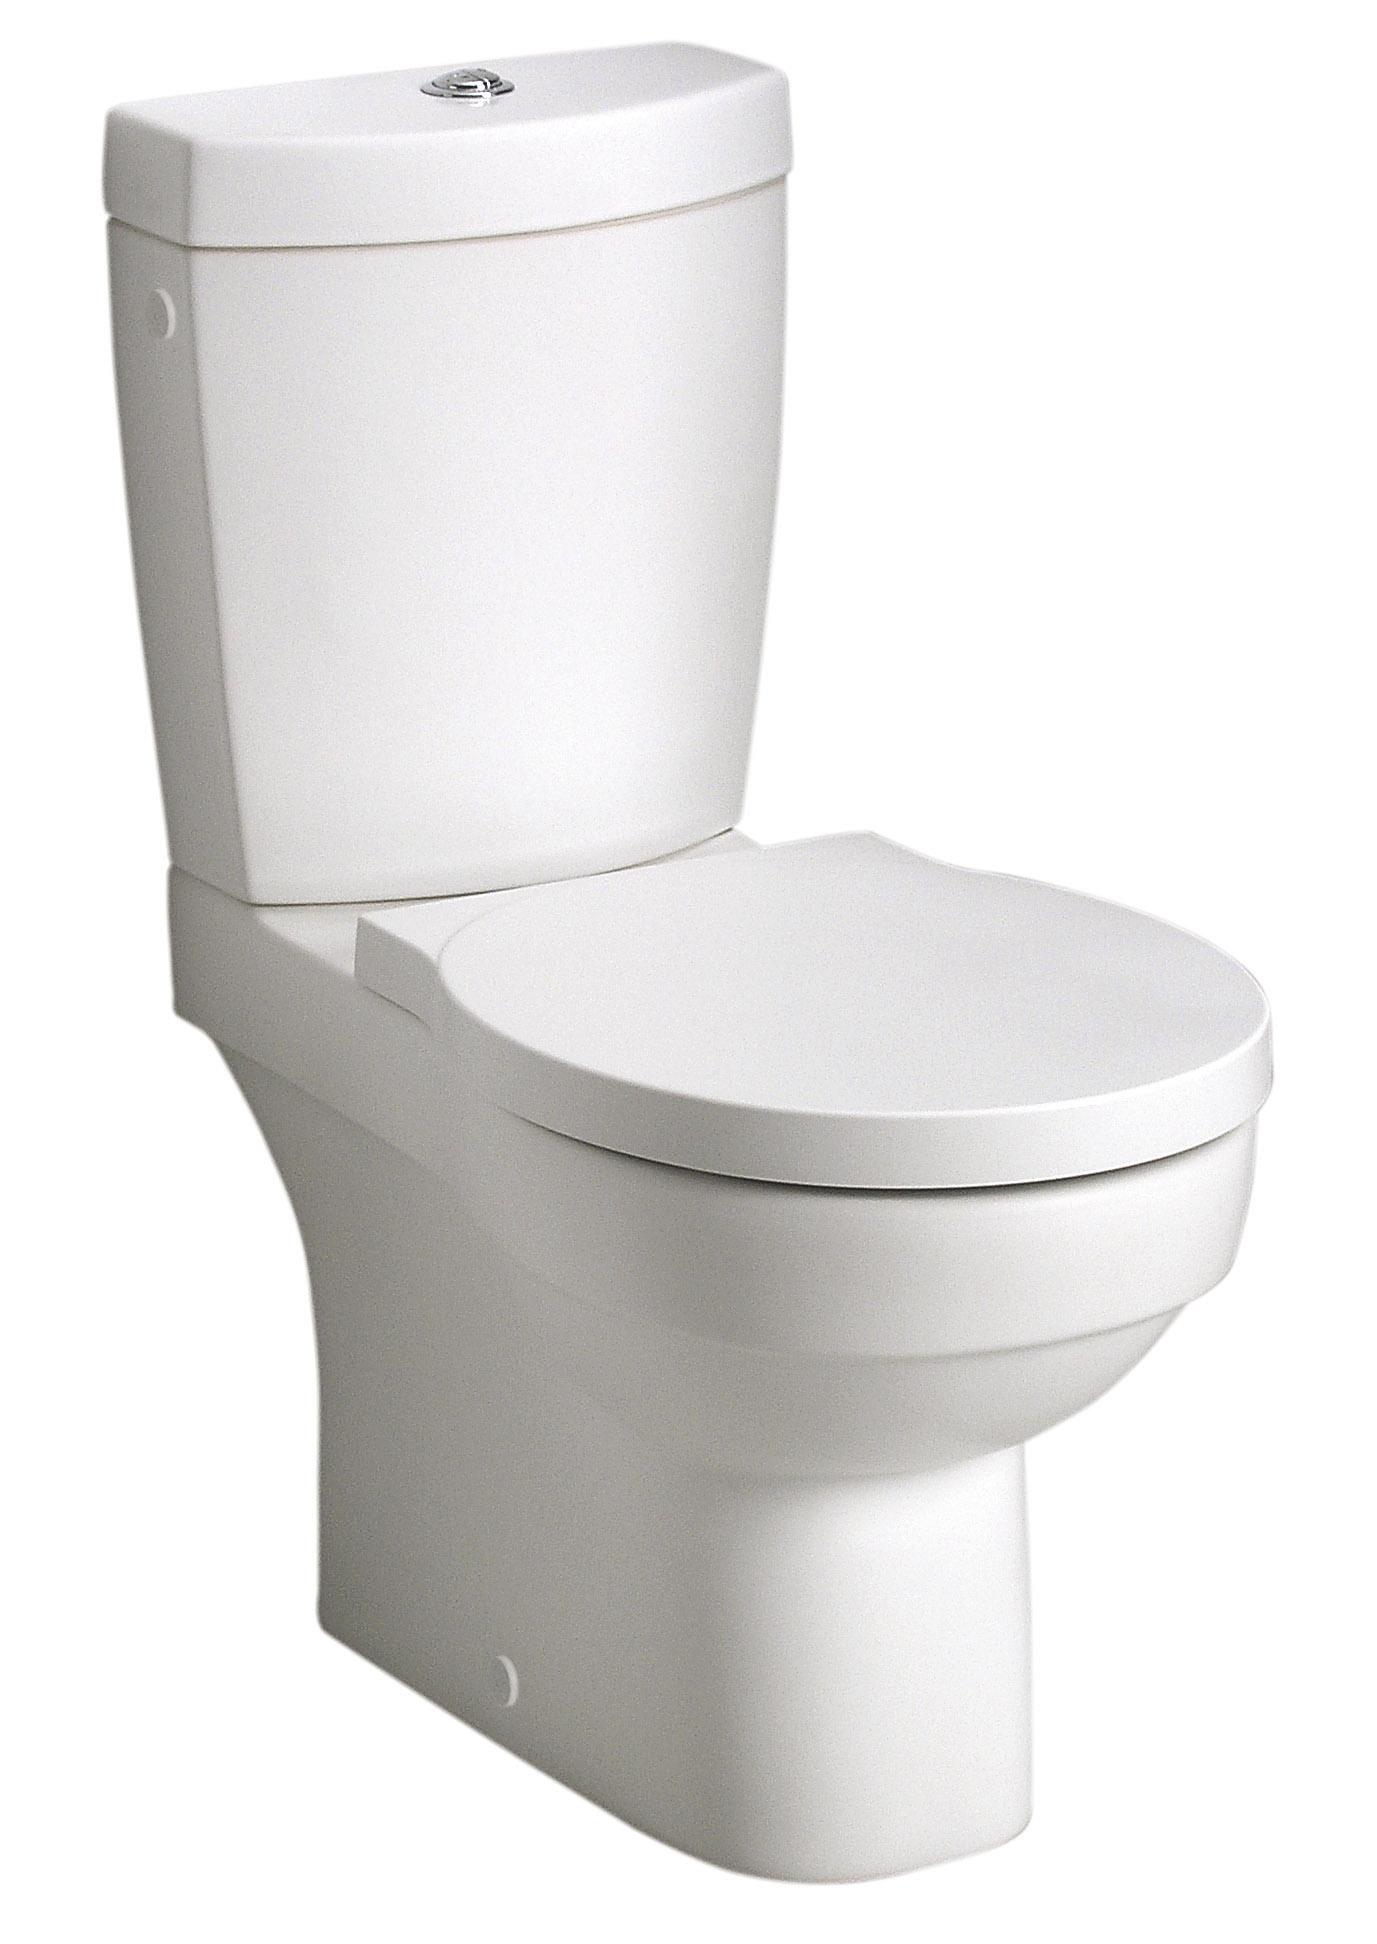 wc/klozety KOLO Varius WC kombi SET Reflex